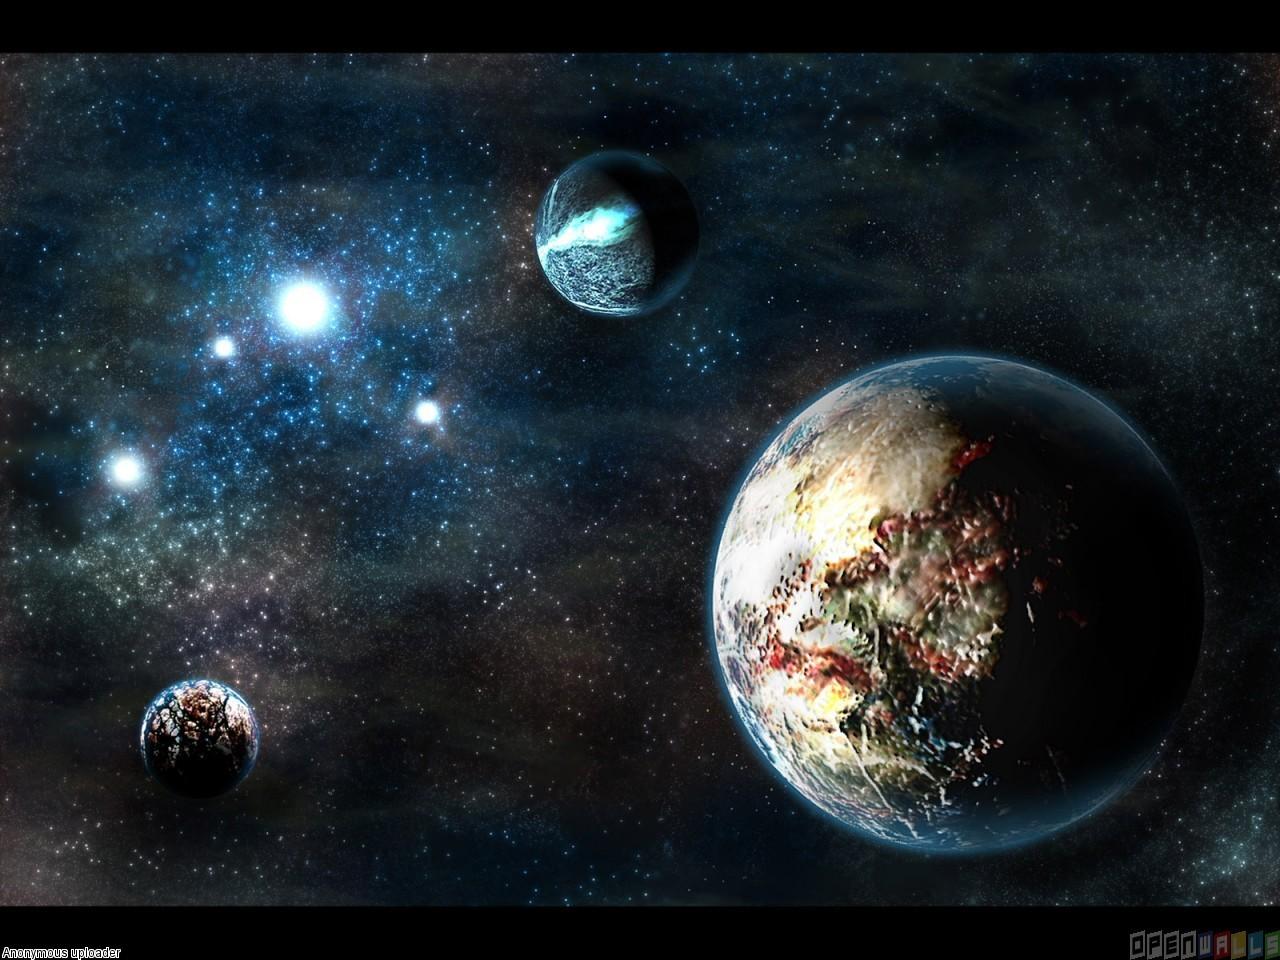 Deep Space Wallpaper   Widescreen HD Wallpapers 1280x960